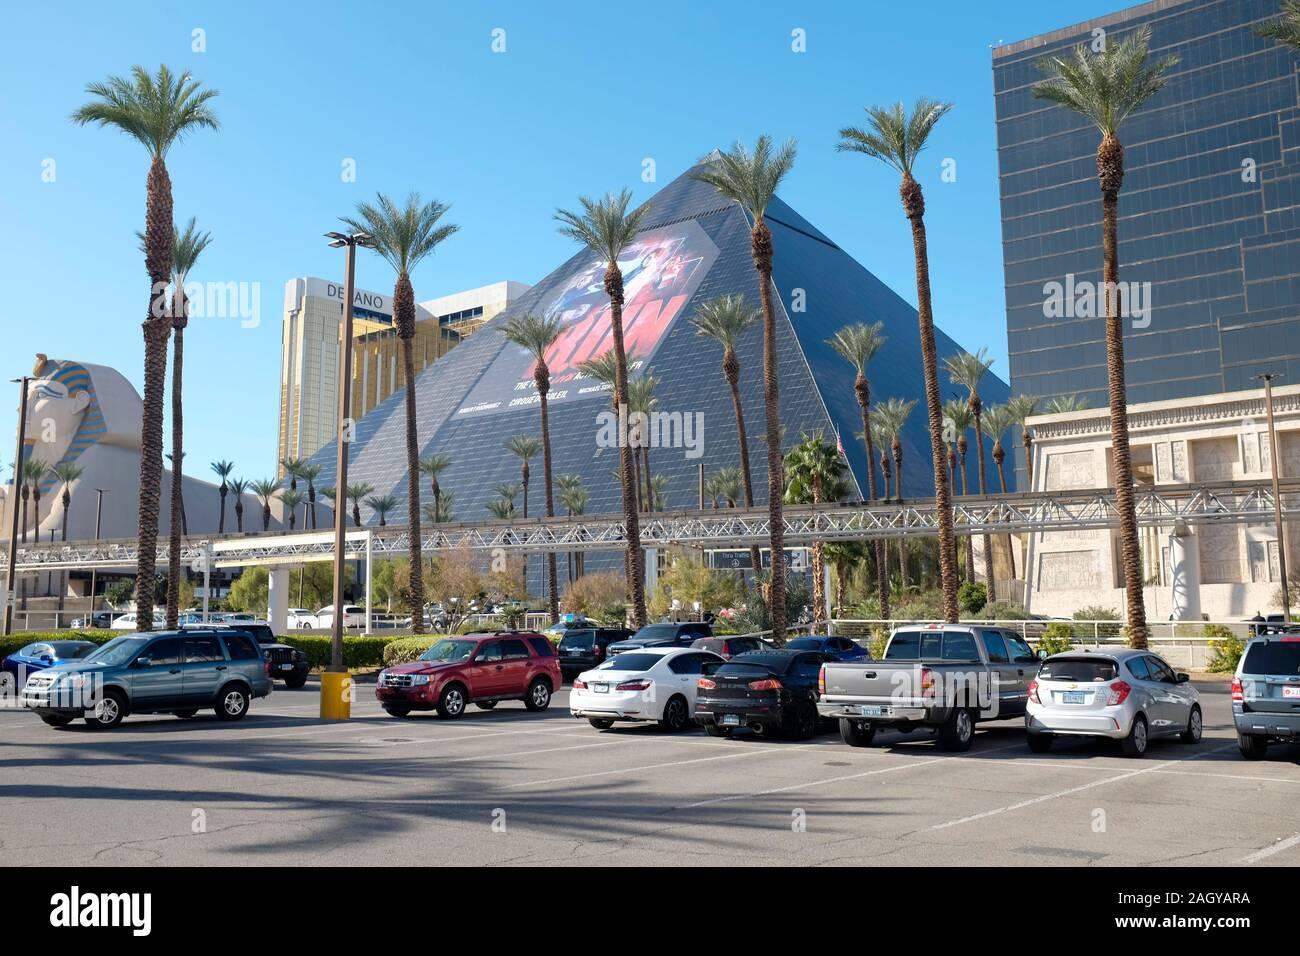 Luxor resort Hotel and Casino, Las Vegas, Nevada, USA. Stock Photo